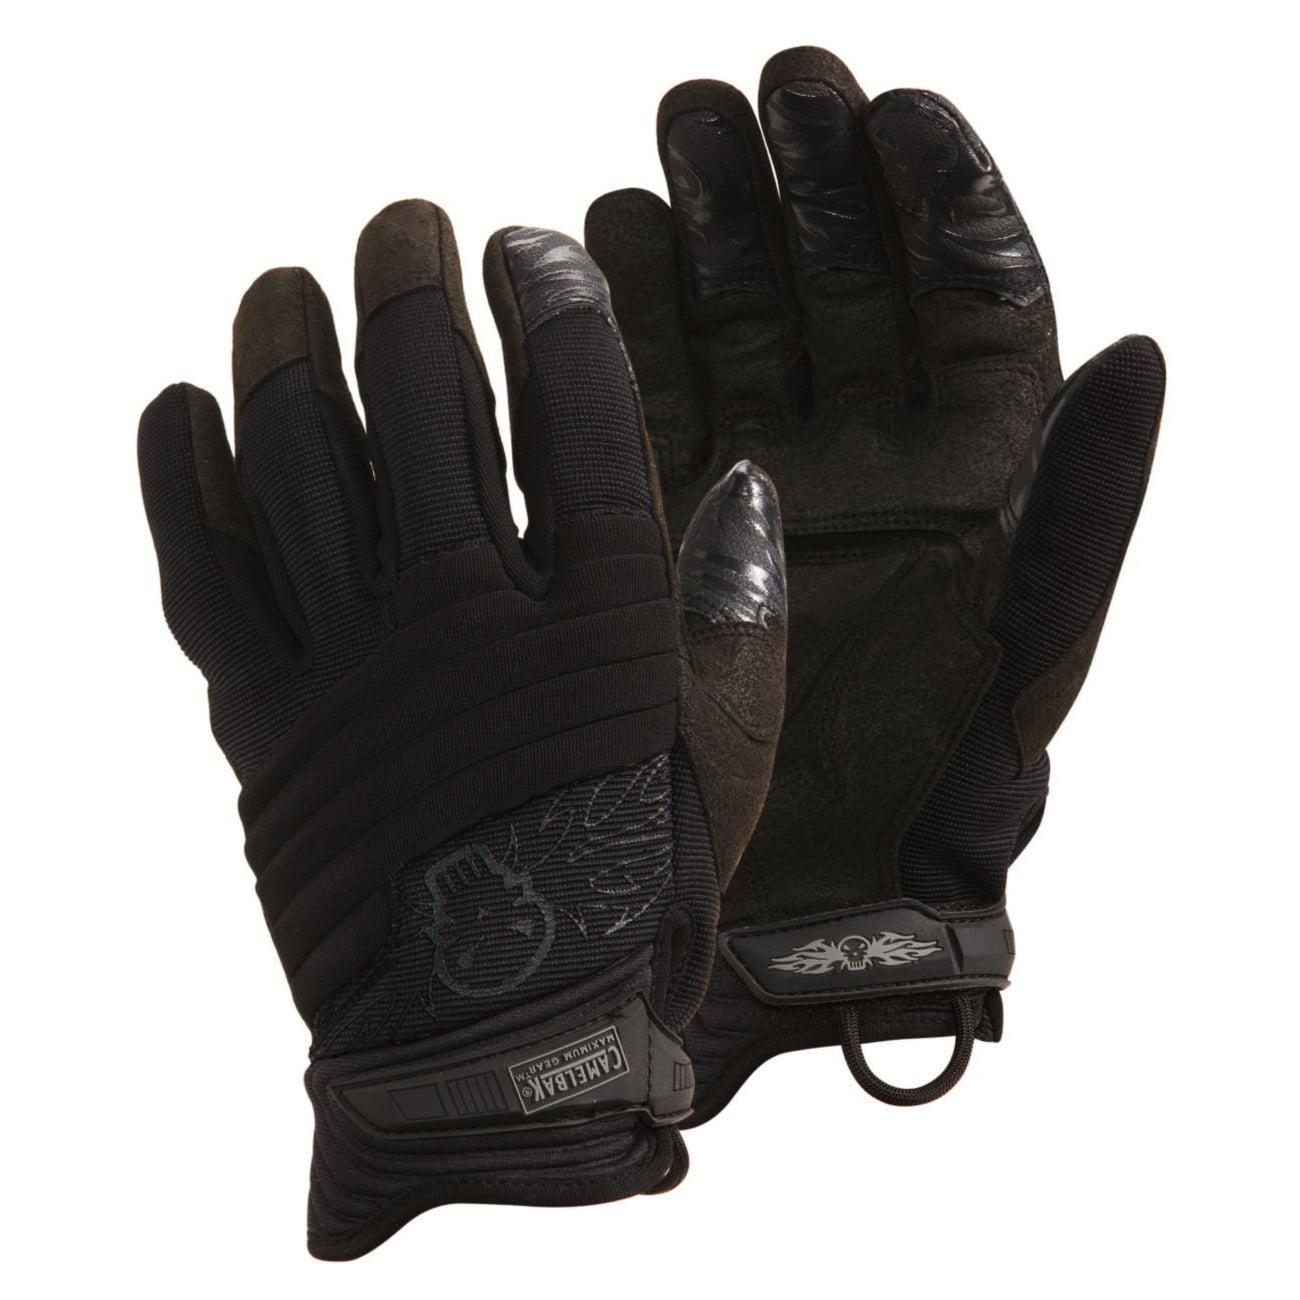 *CamelBak MP2LG05-08 Hi-Tech Impact II CT Gloves Blk Logo S